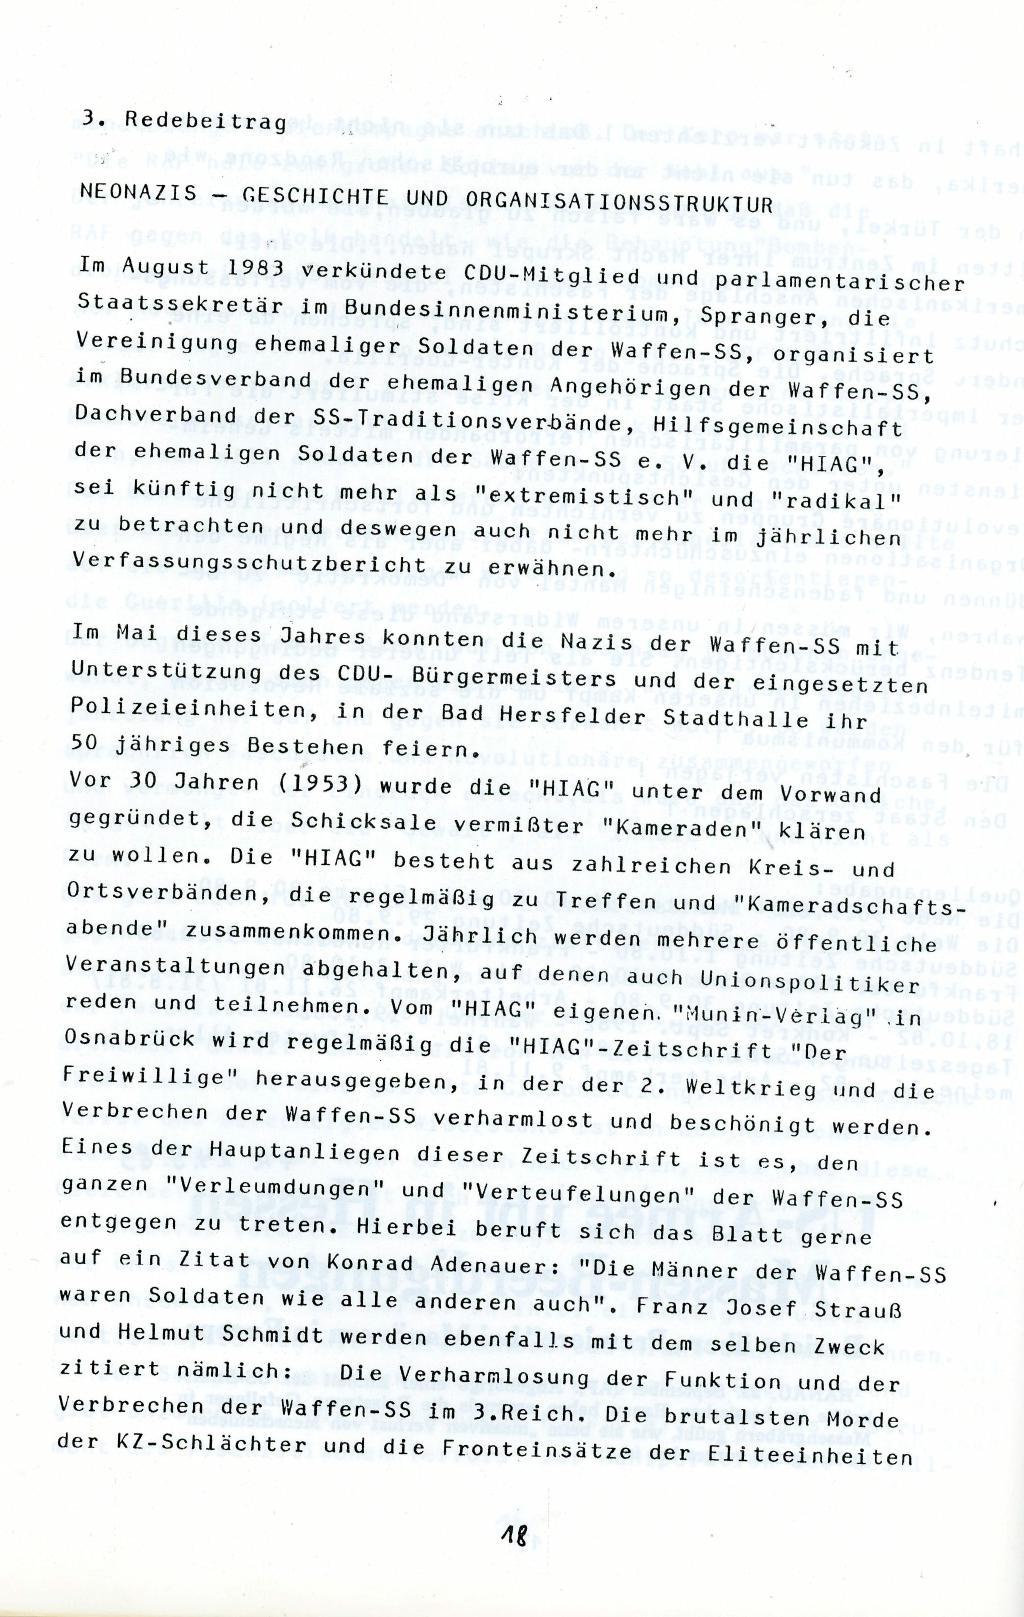 Berlin_1983_Autonome_Gruppen_Faschismus_im_Kapitalismus_18